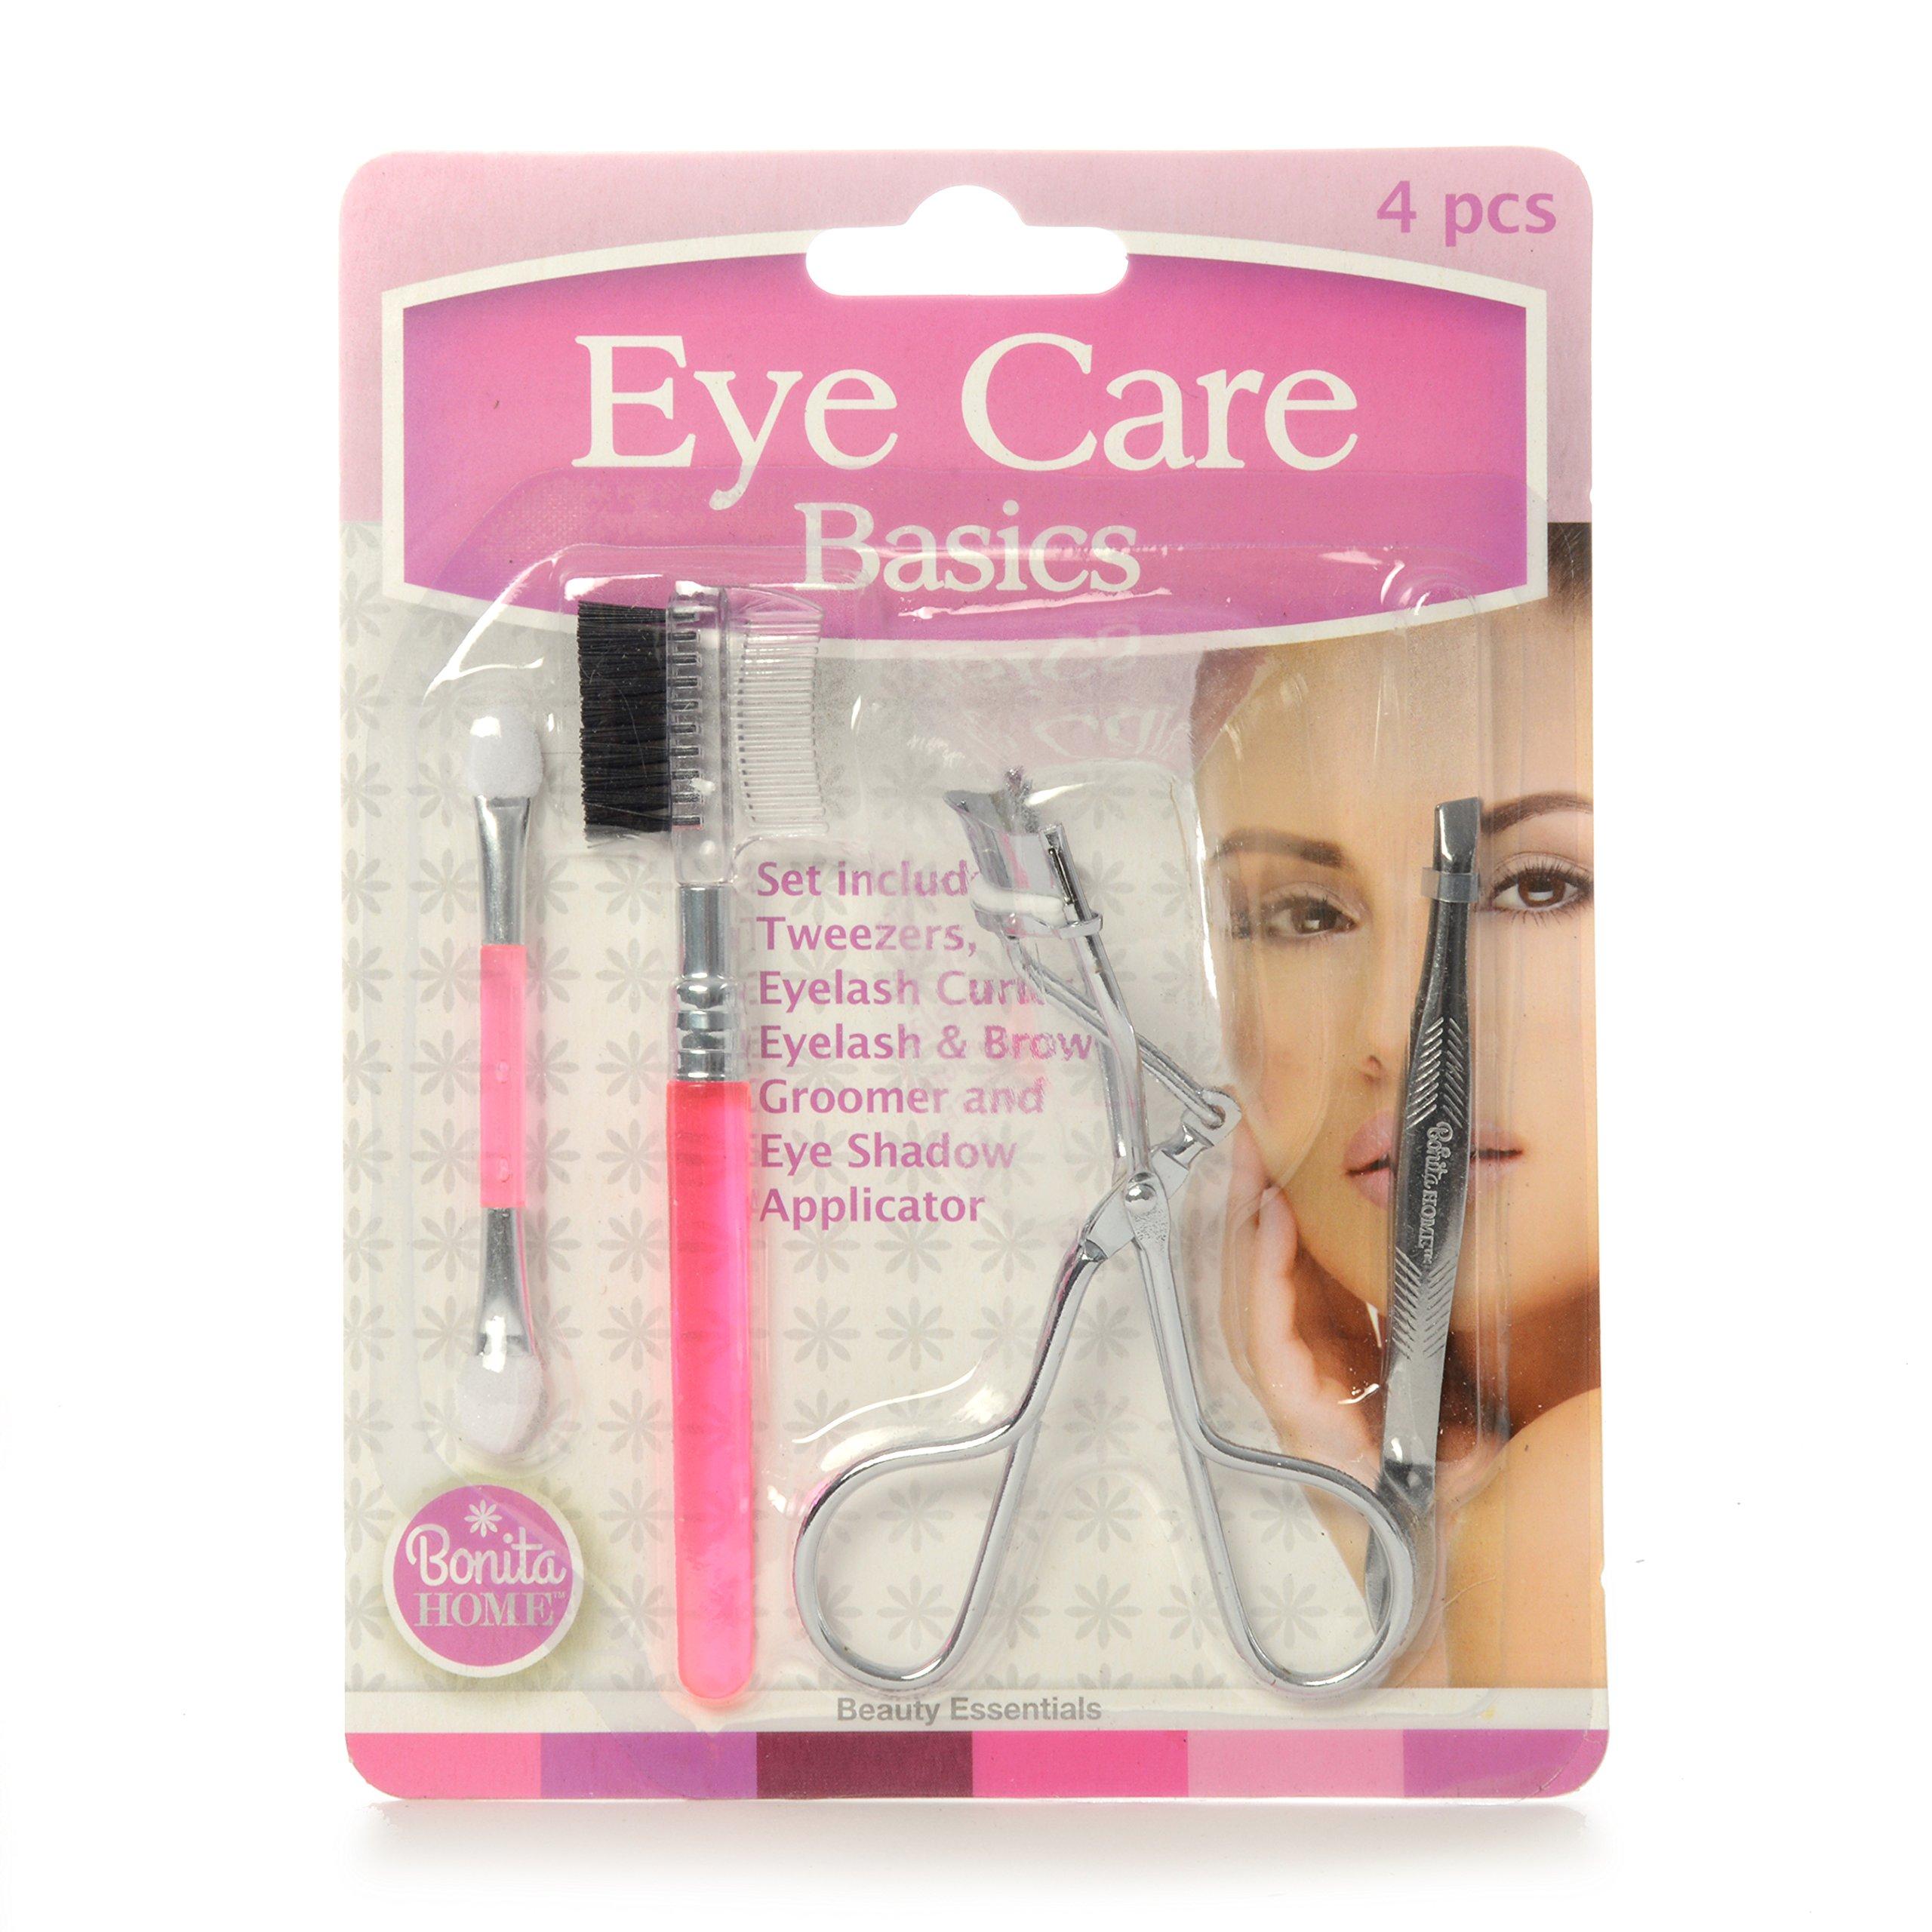 Eye Care Essentials, 32g. 4pc, Case of 36